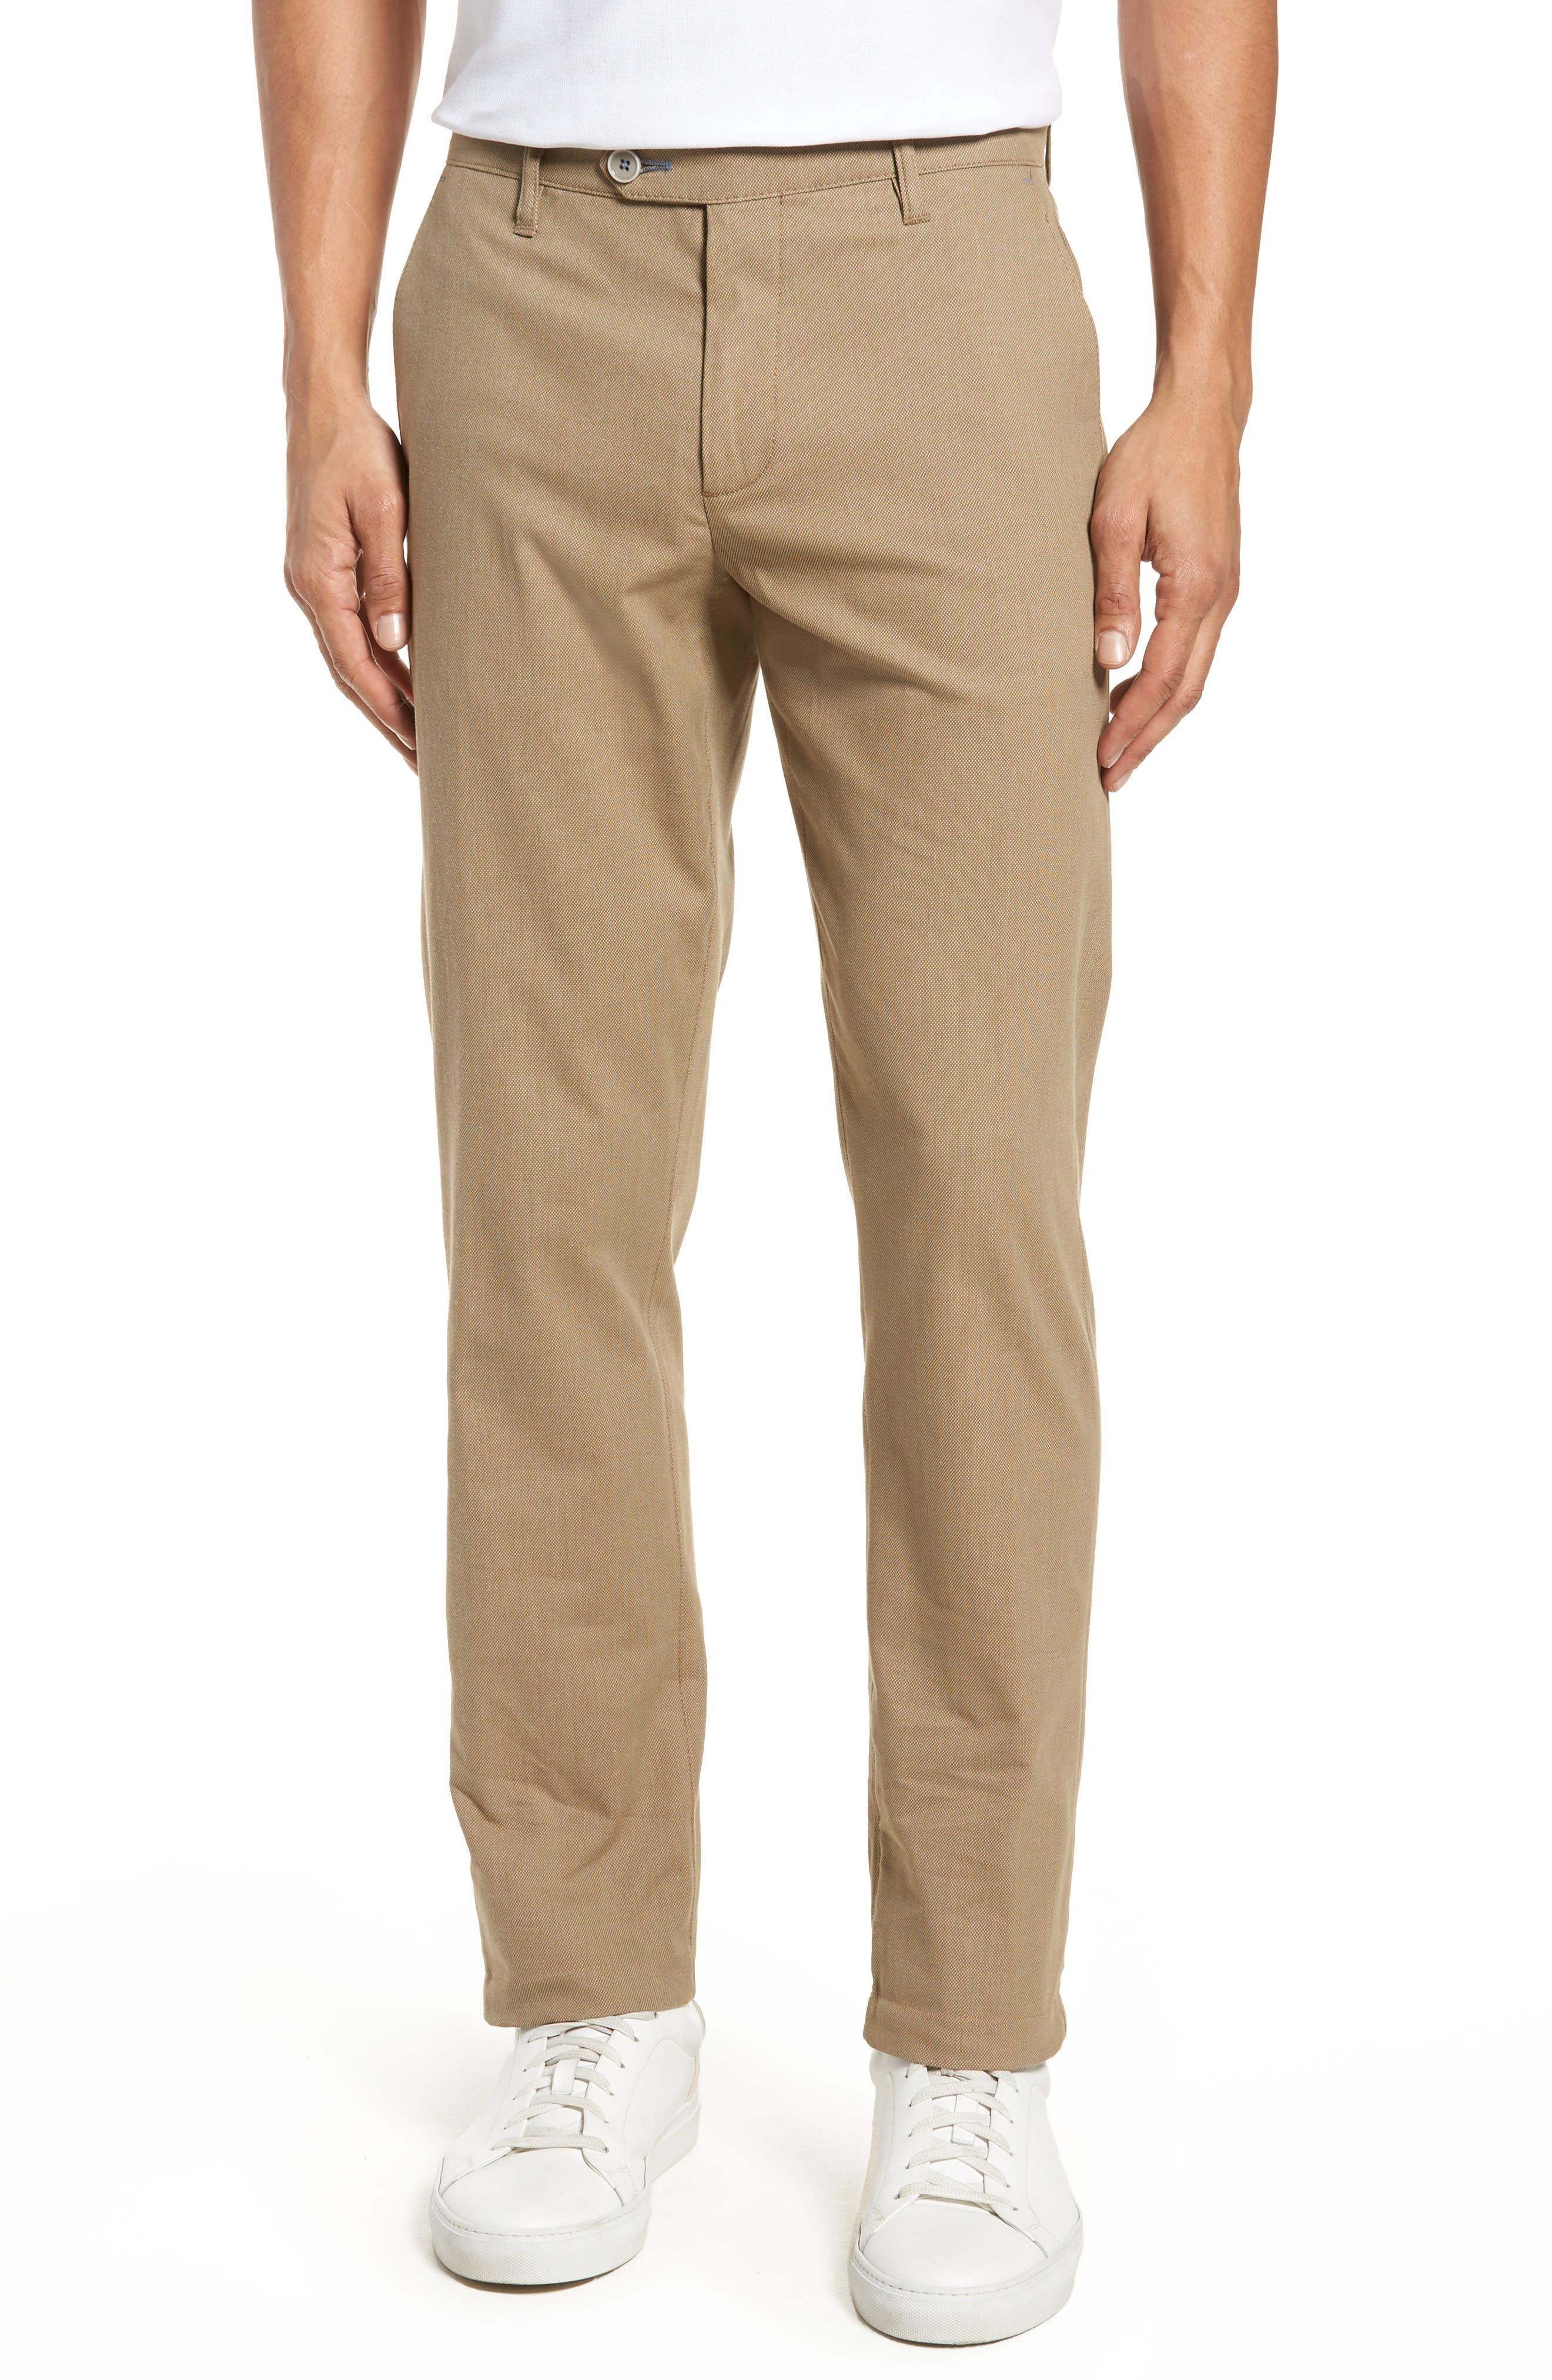 Holclas Classic Fit Chino Pants,                         Main,                         color, Khaki